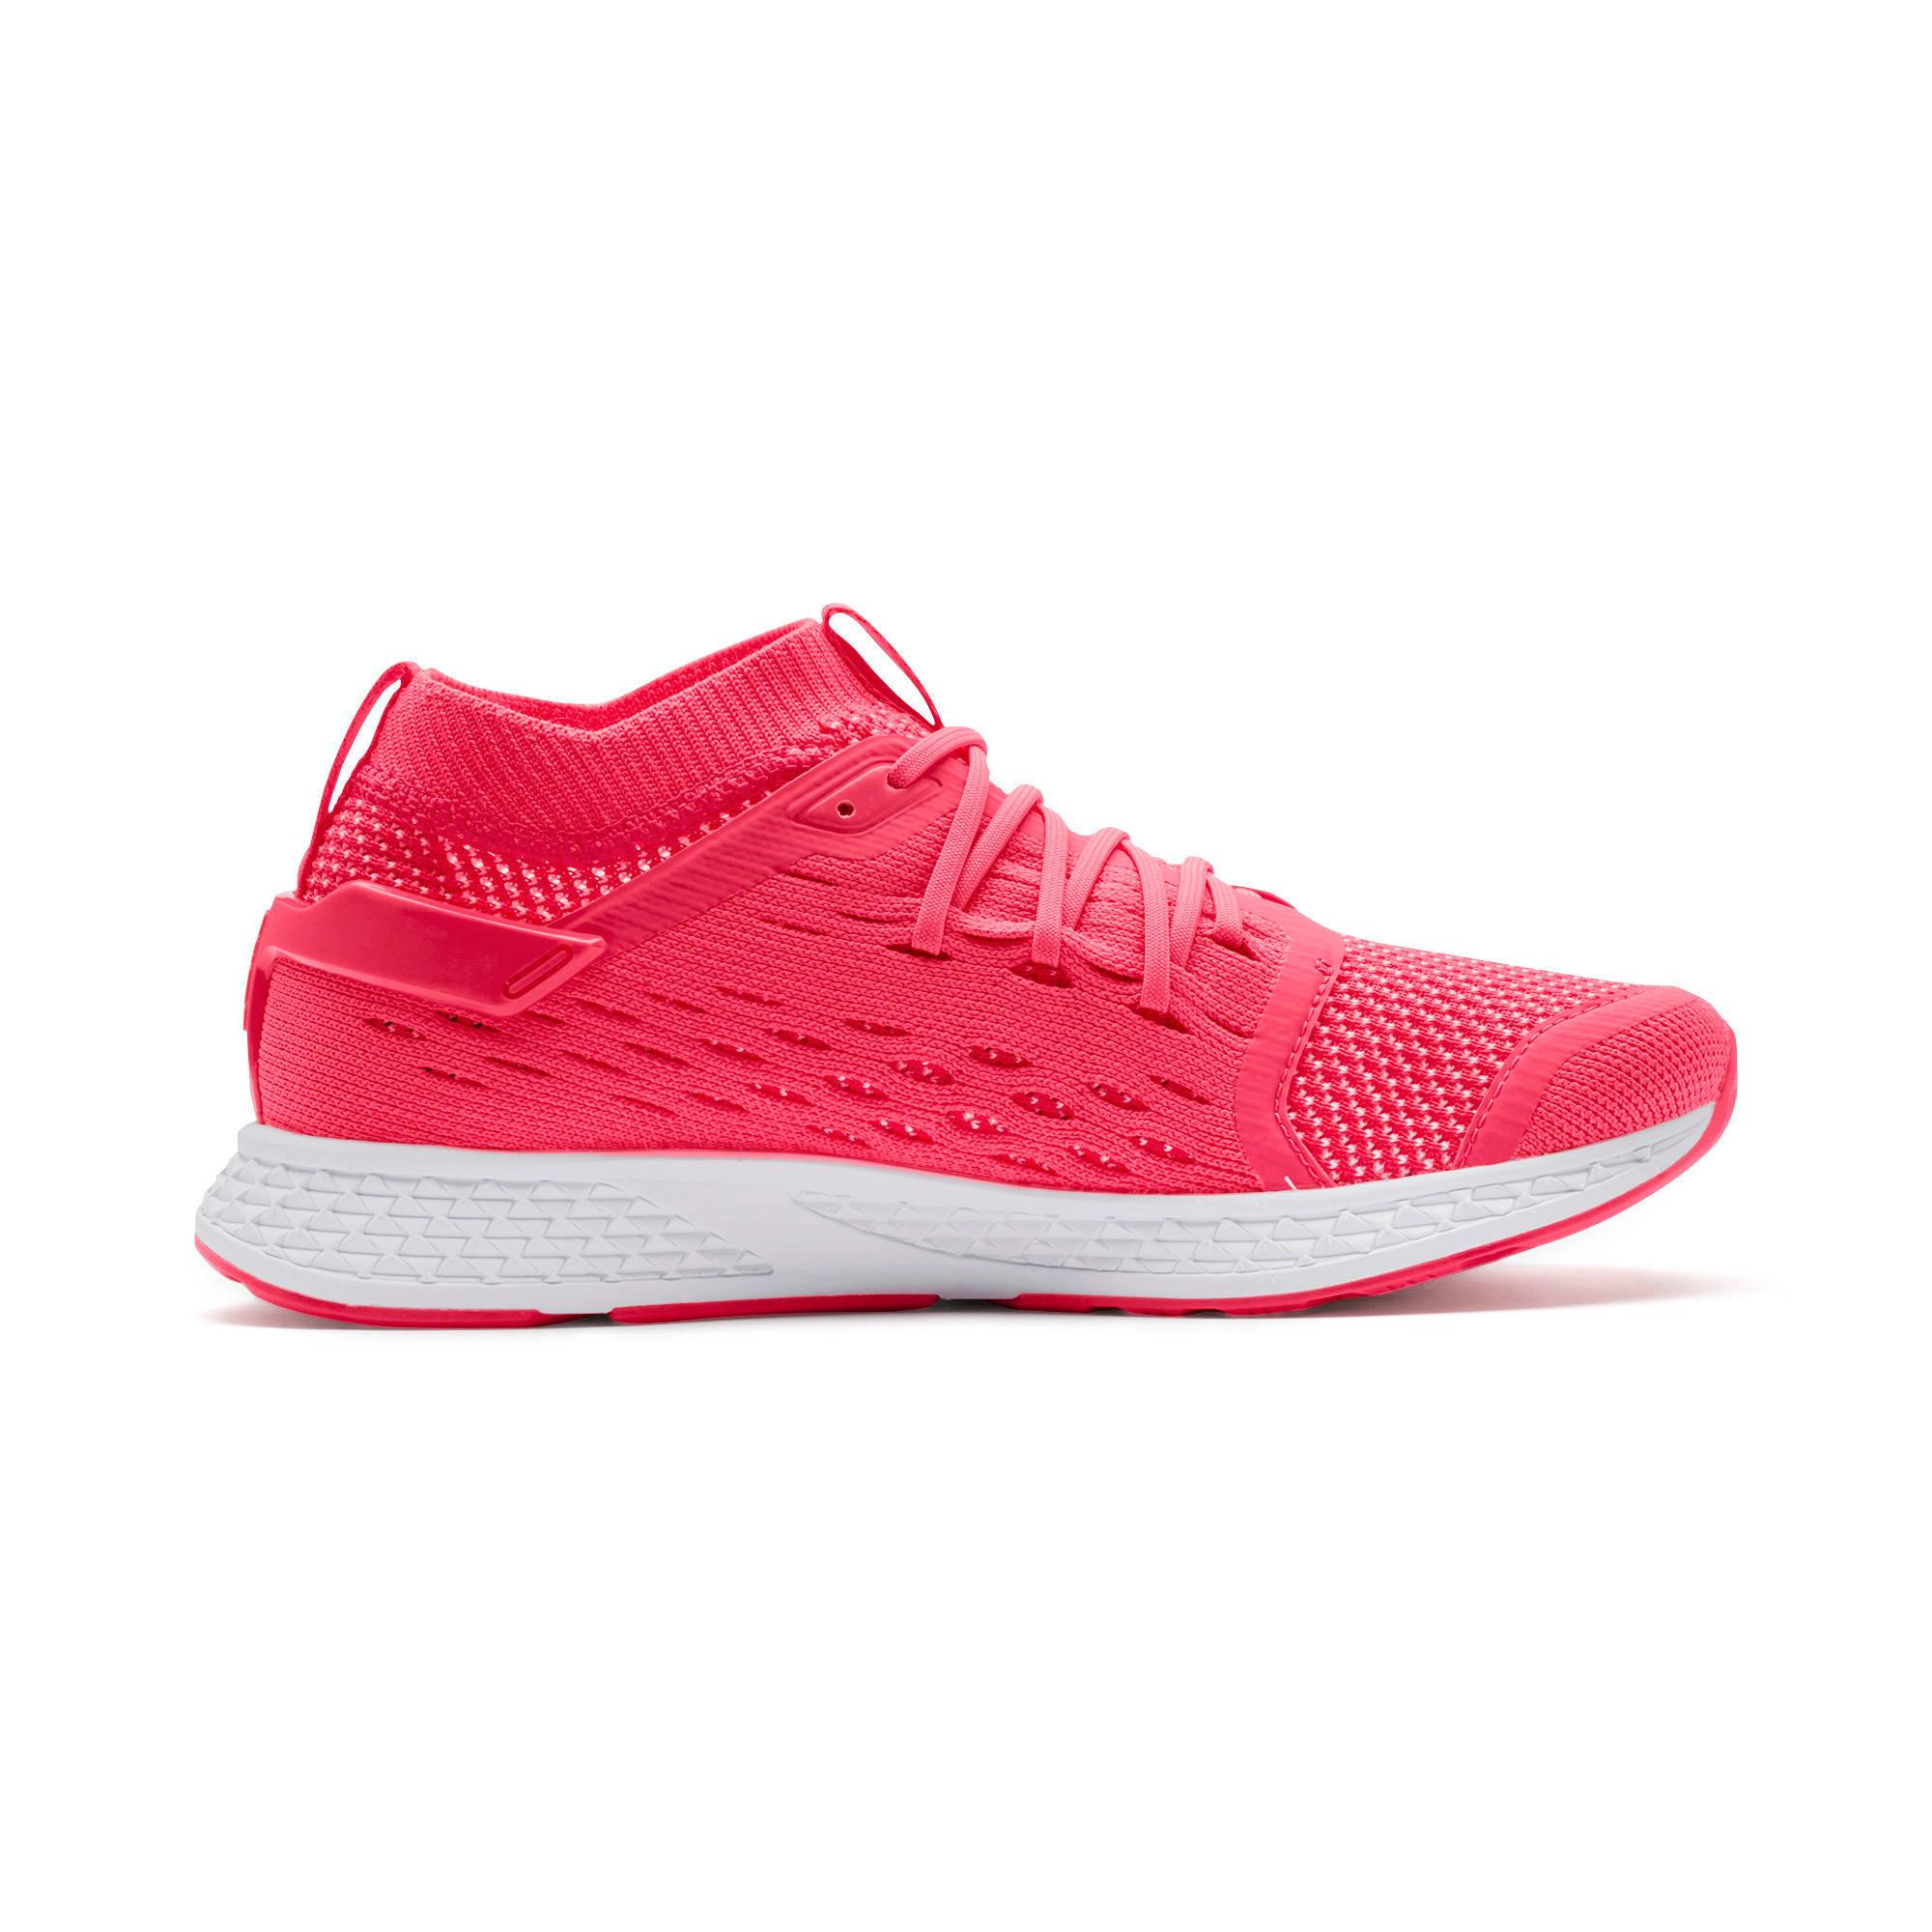 Miniatura 6 de Zapatos para correrSPEED500 para mujer, Pink Alert-White-Yellow, mediano